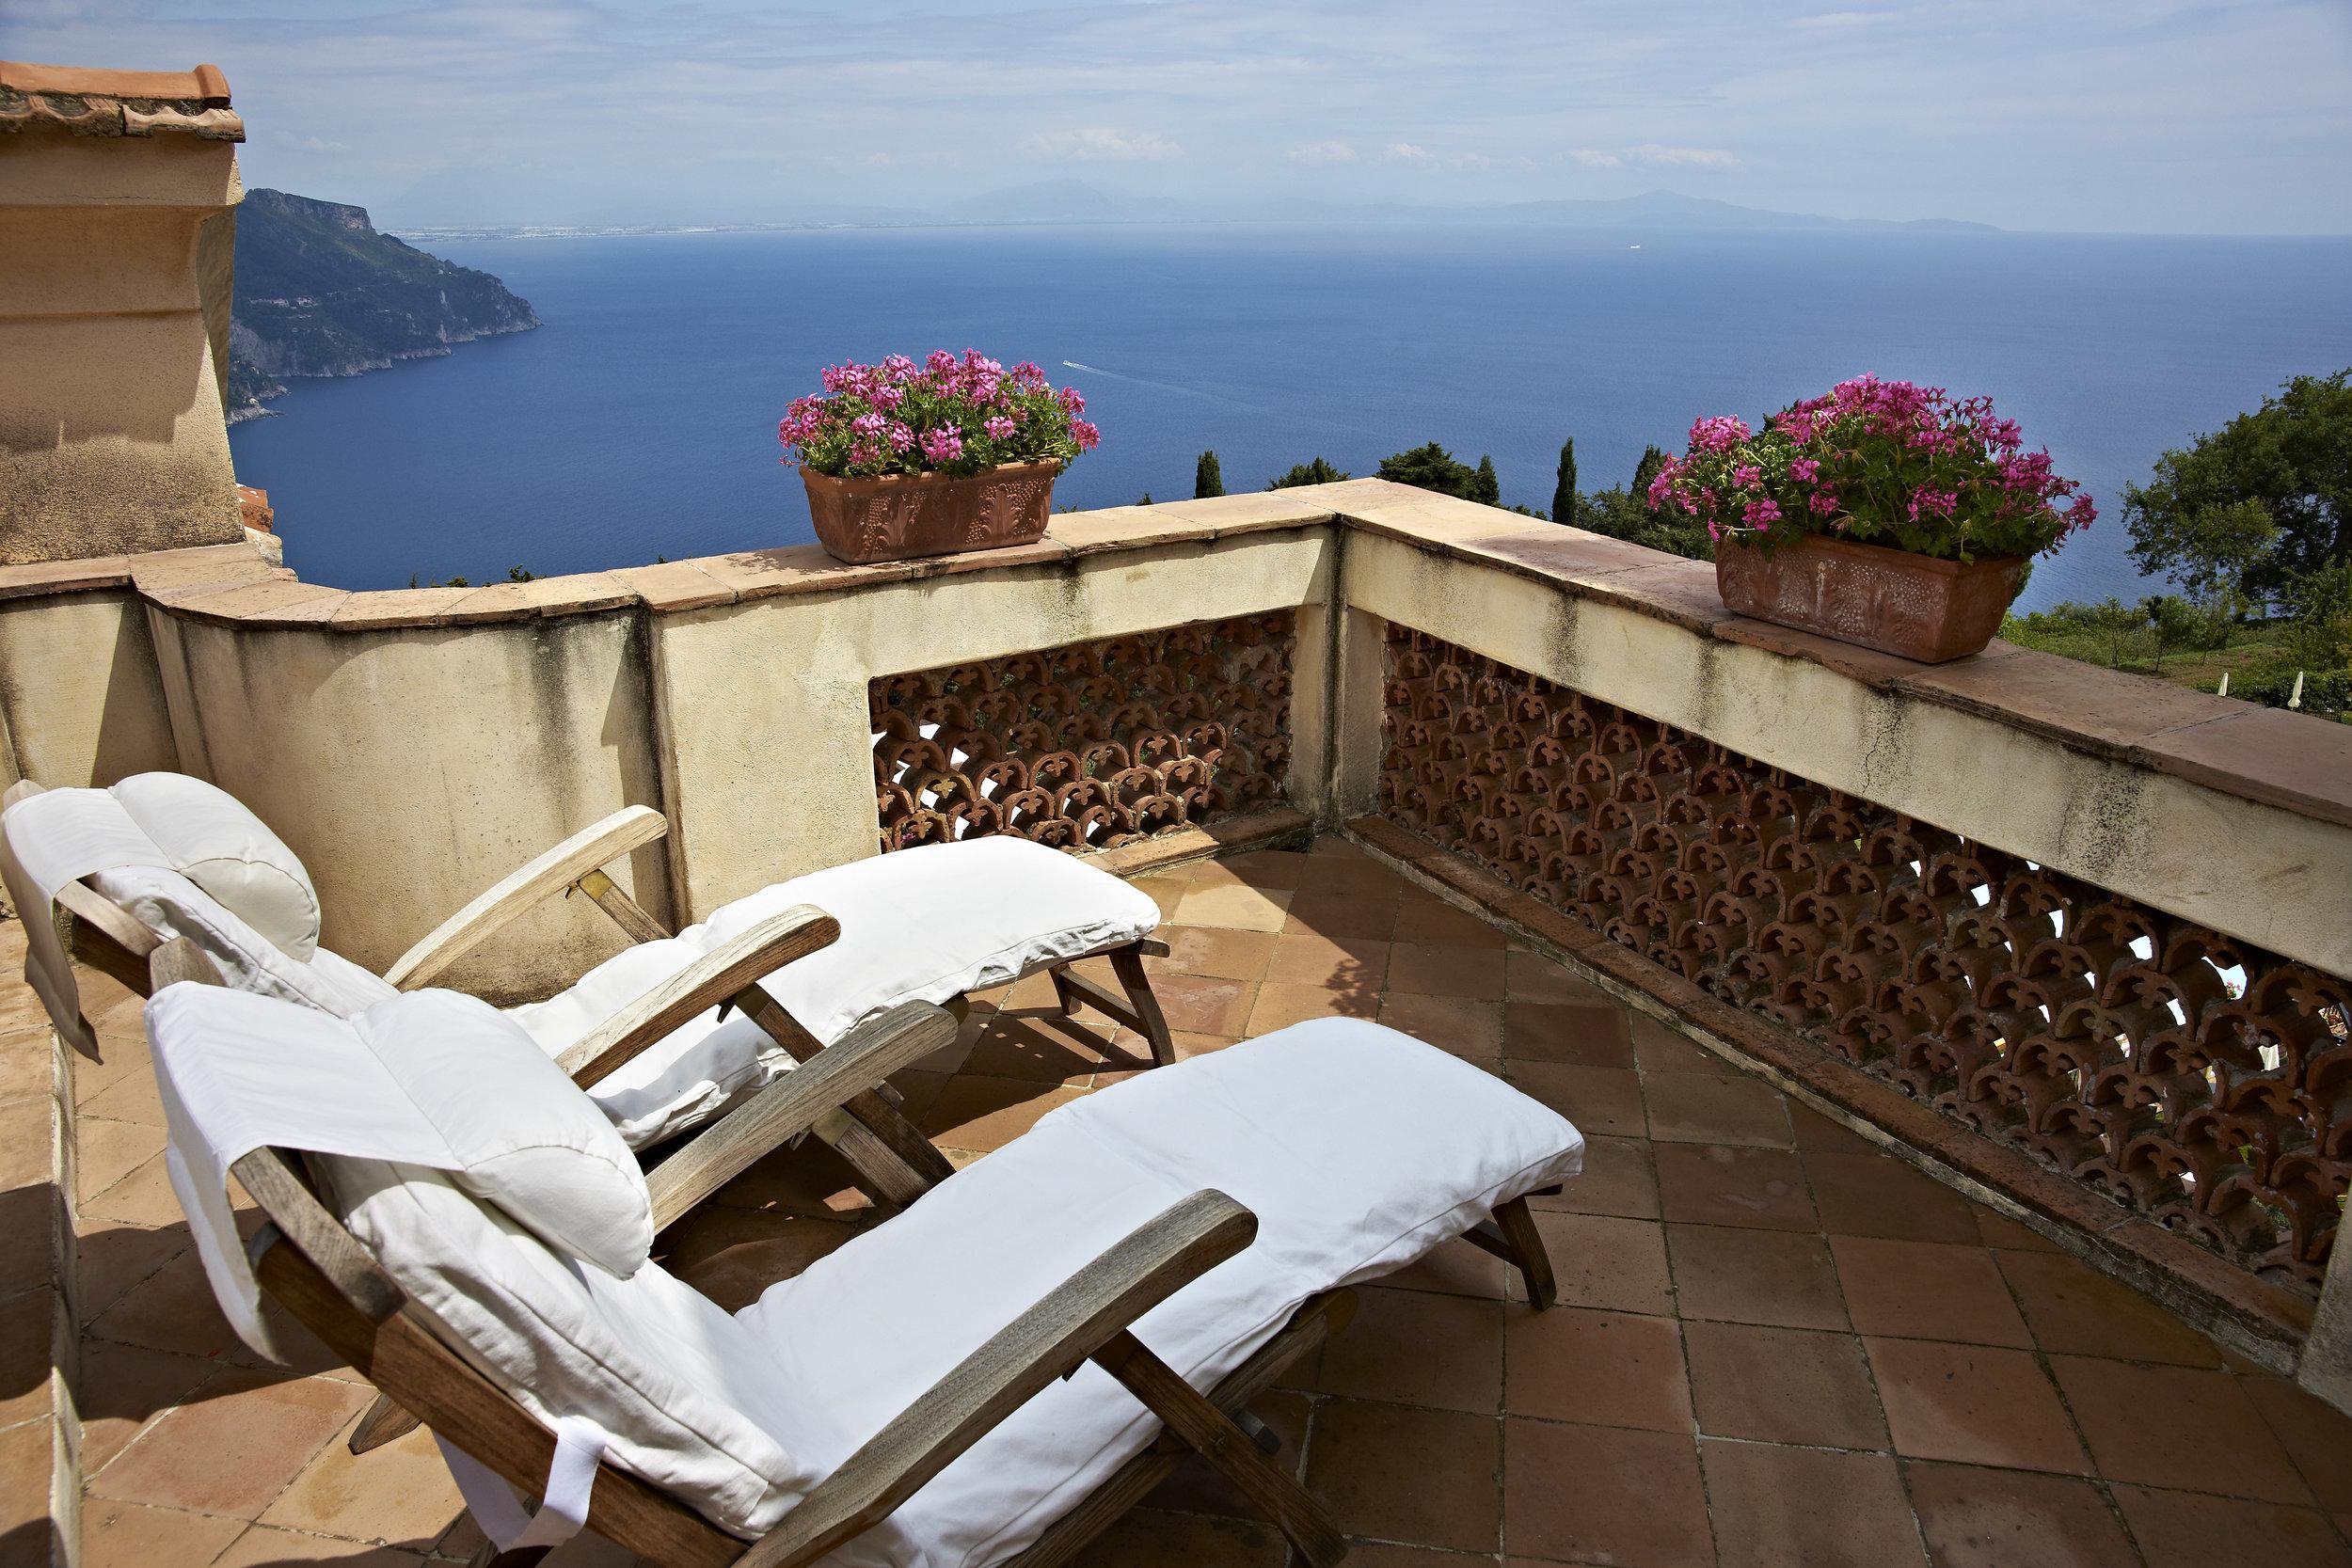 Hotel Villa Cimbrone0471.jpg